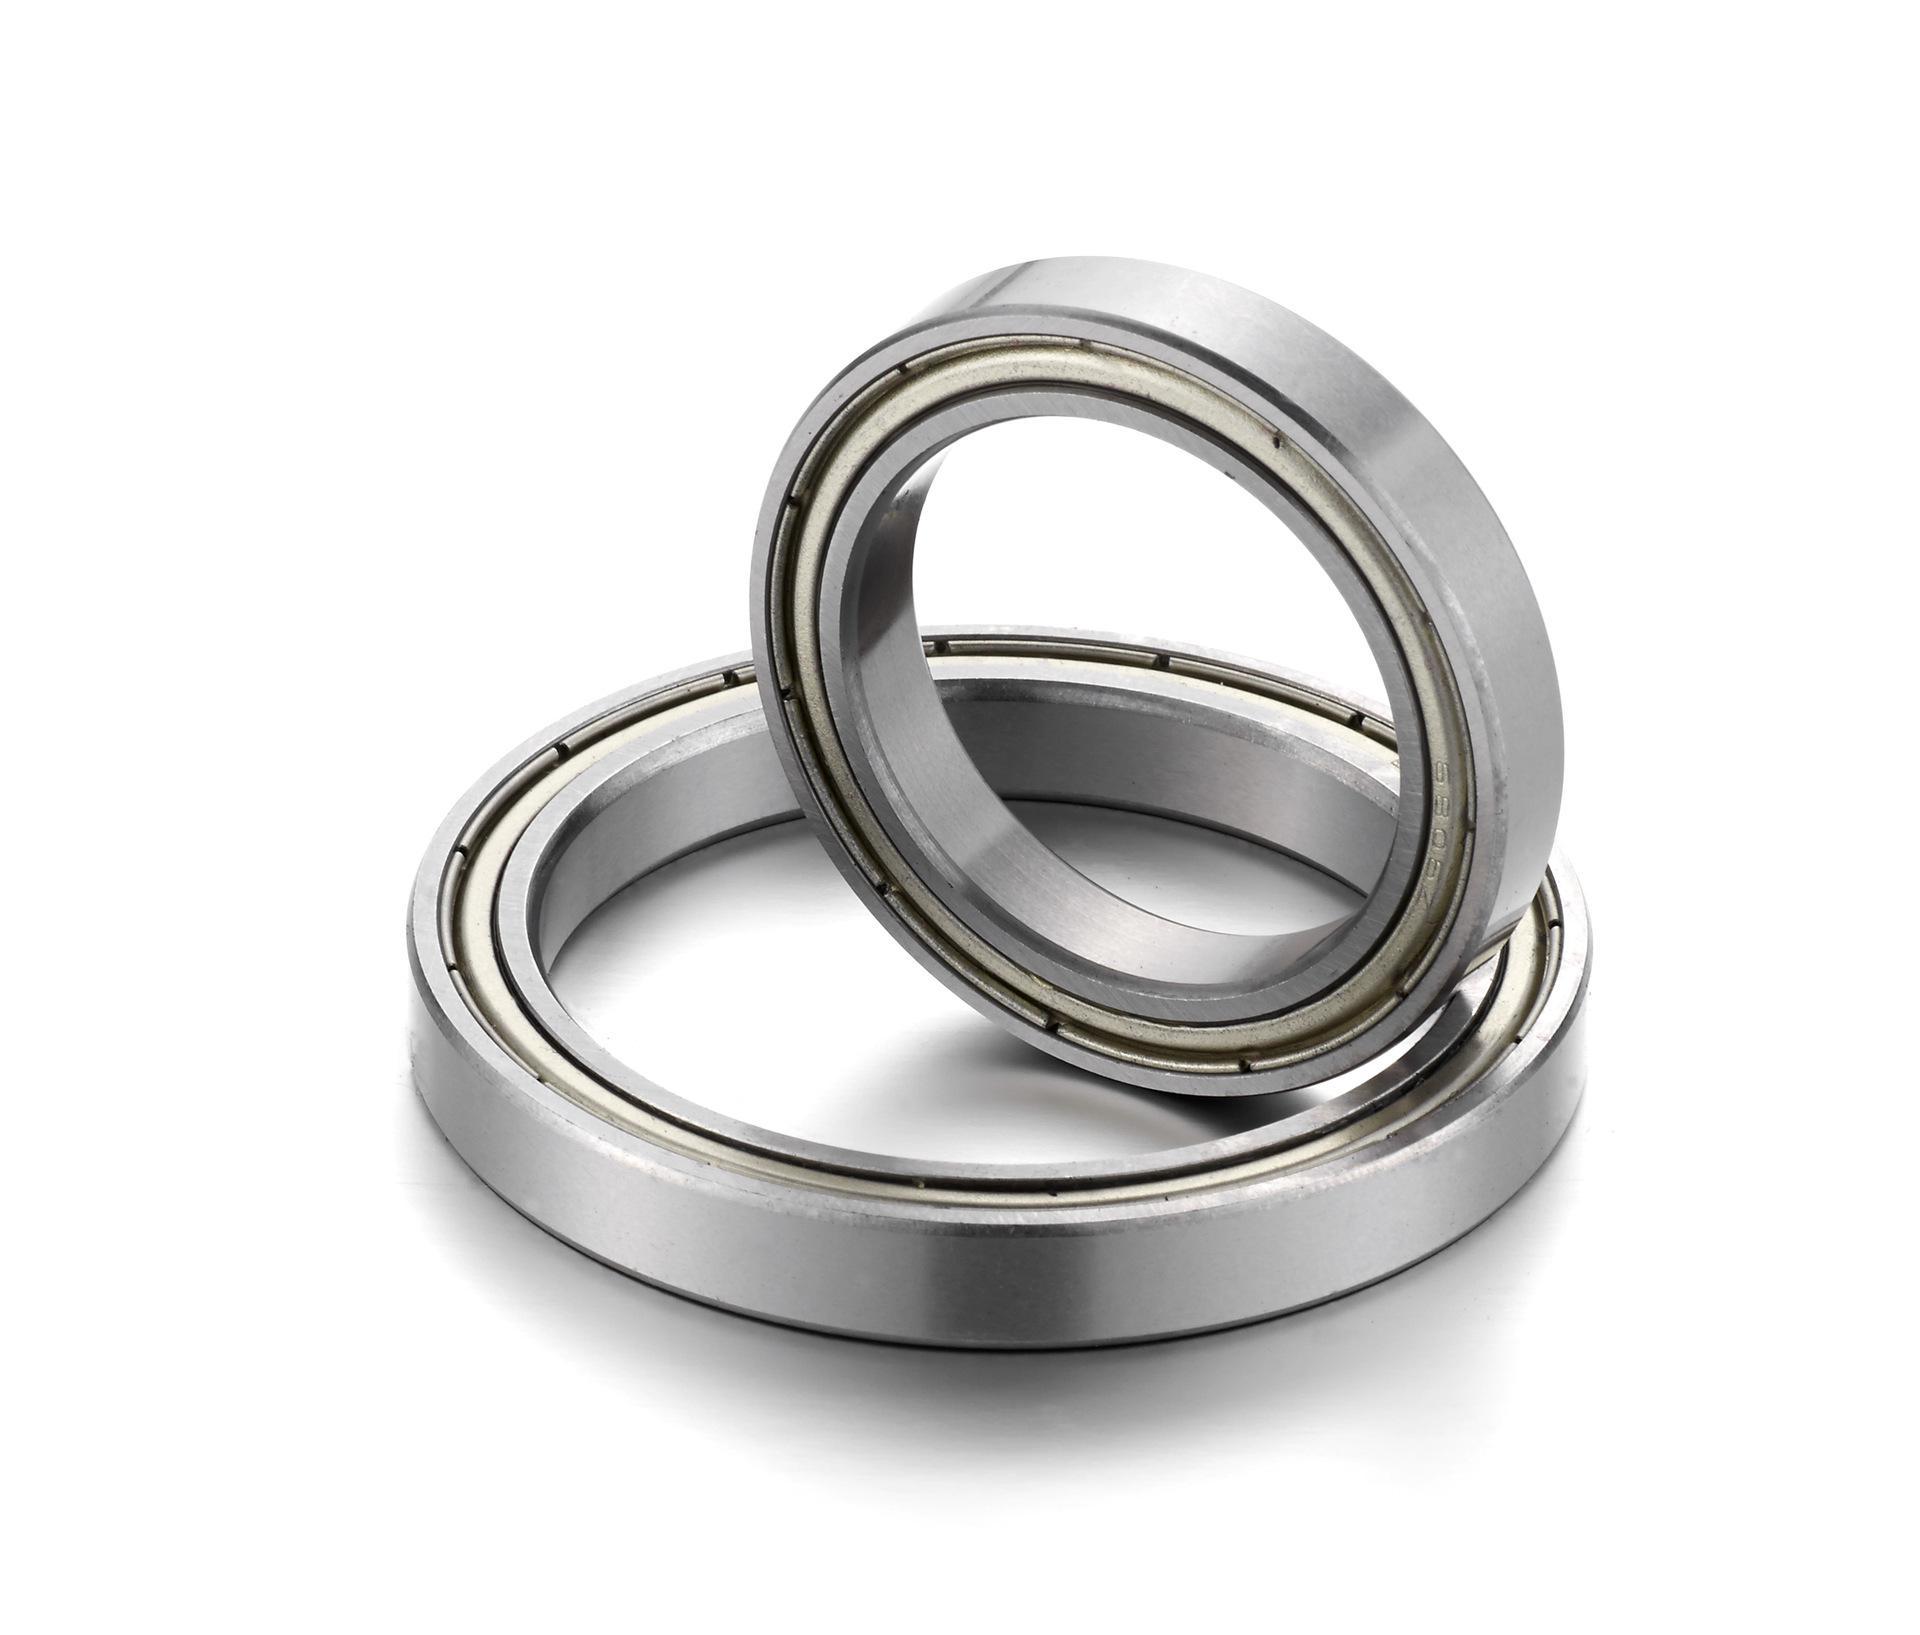 6930M  ABEC-1 150x210x28MM  Metric Thin Section Bearings 61930M Brass cage 1pcs 71901 71901cd p4 7901 12x24x6 mochu thin walled miniature angular contact bearings speed spindle bearings cnc abec 7